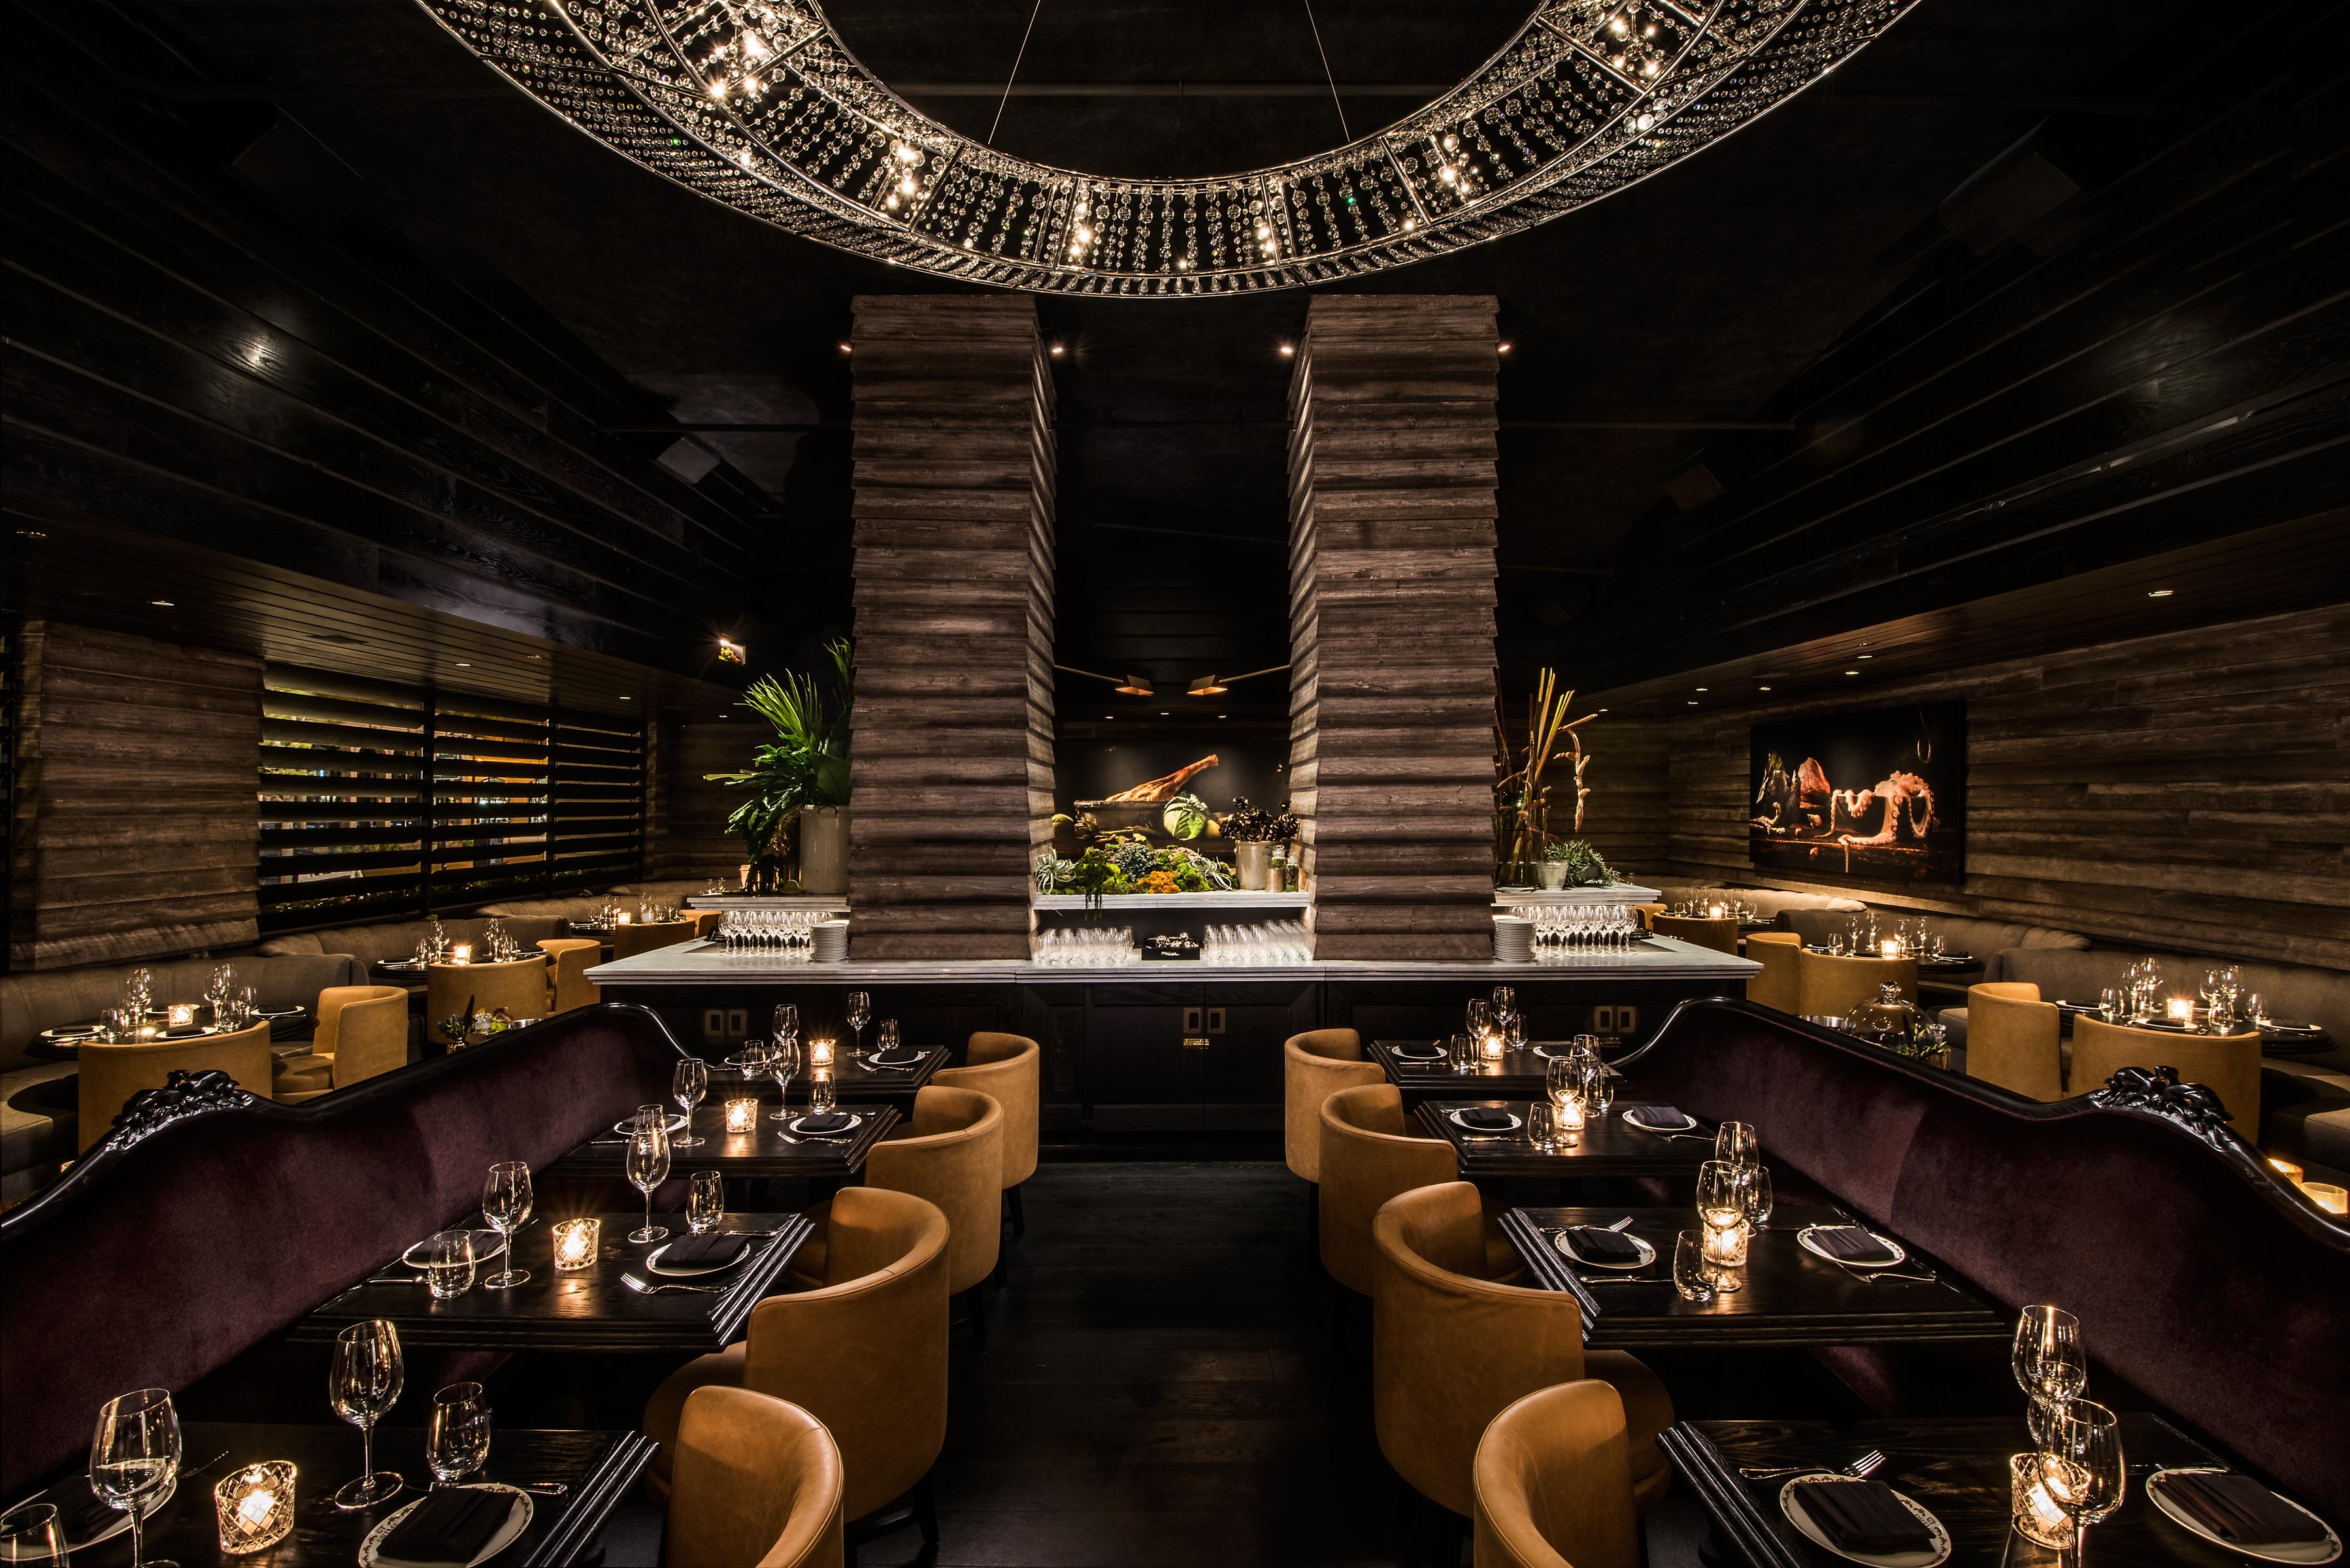 Steakhouse Restaurants Now Best